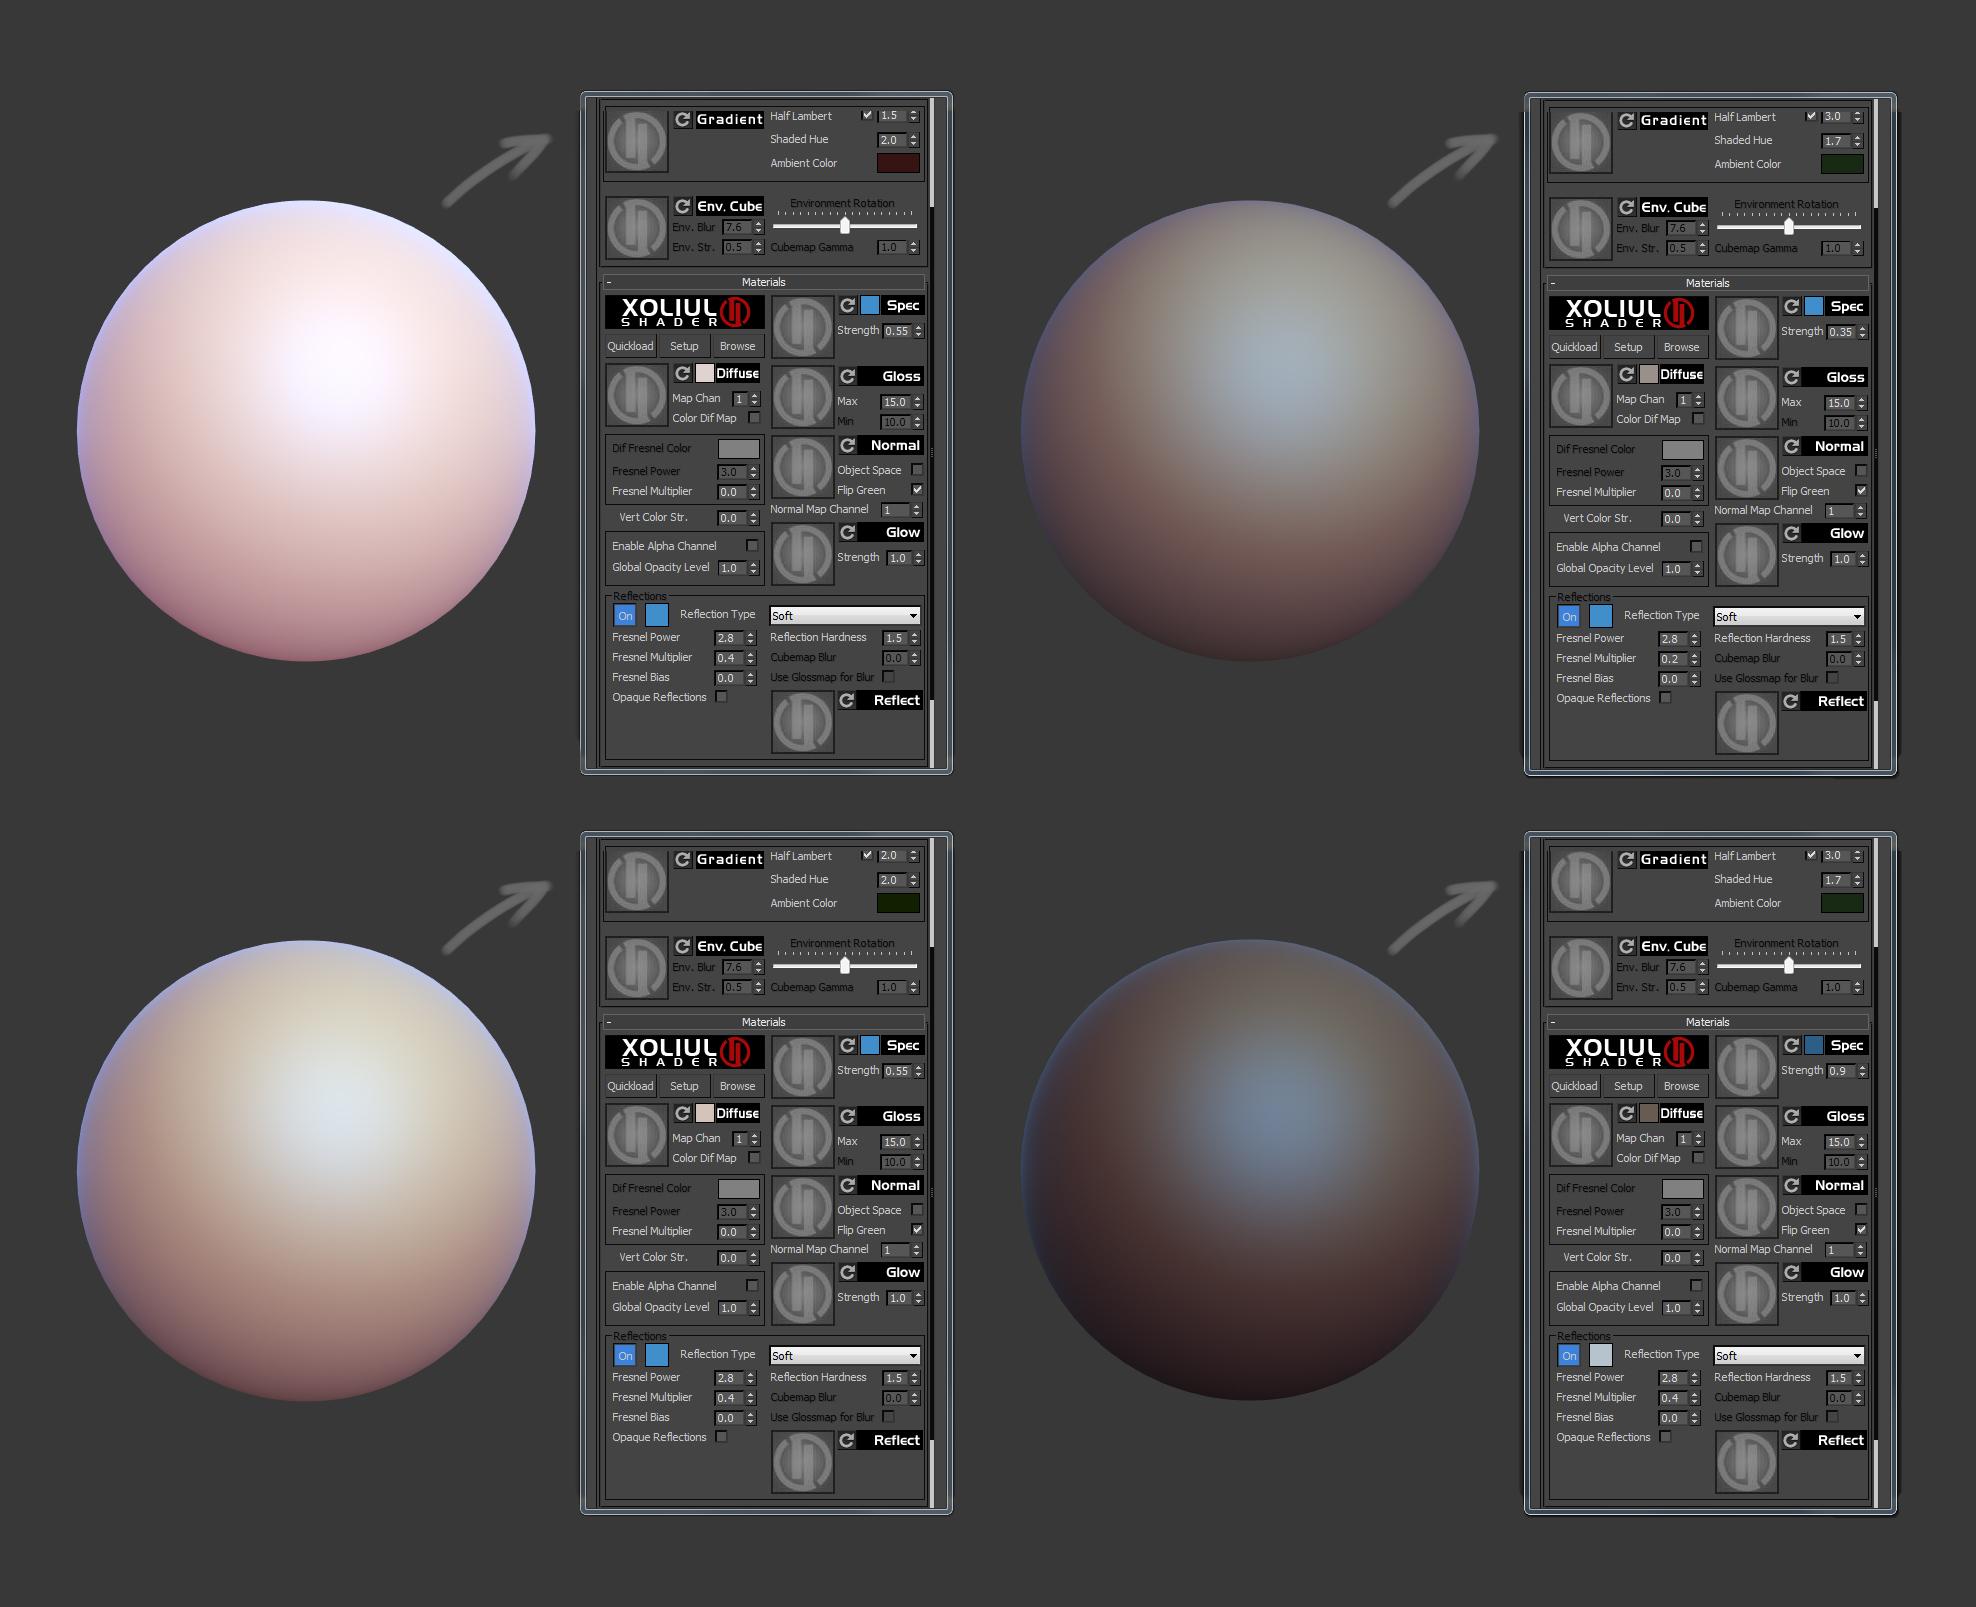 Xoliul 2.0 Skin Shader Settings by HazardousArts